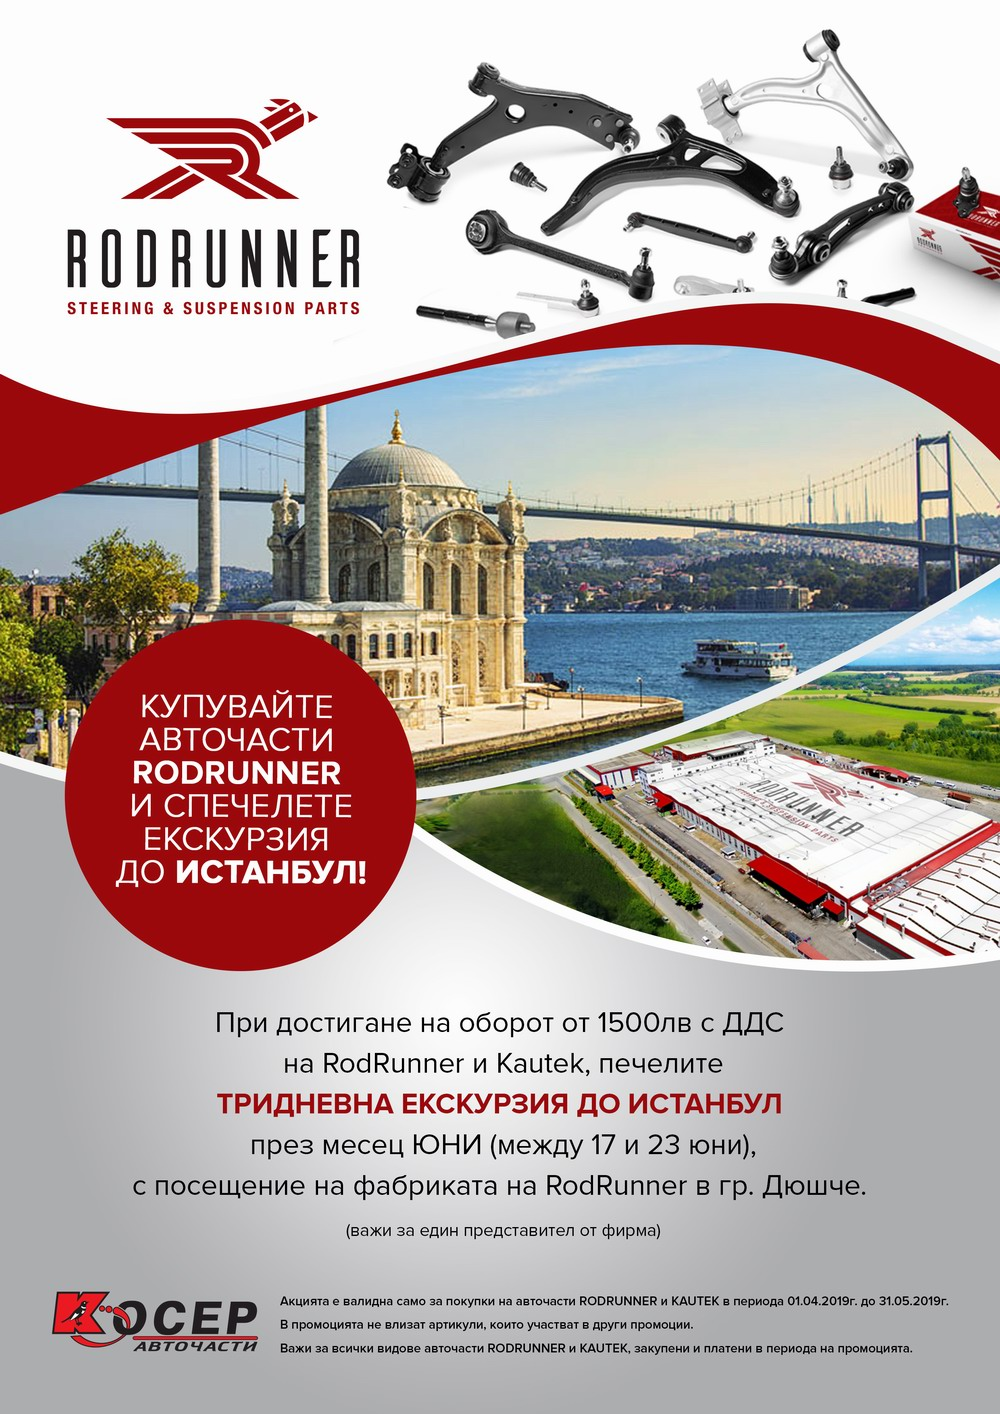 Промоция RODRUNNER, 01.04.2019 - 31.05.2019